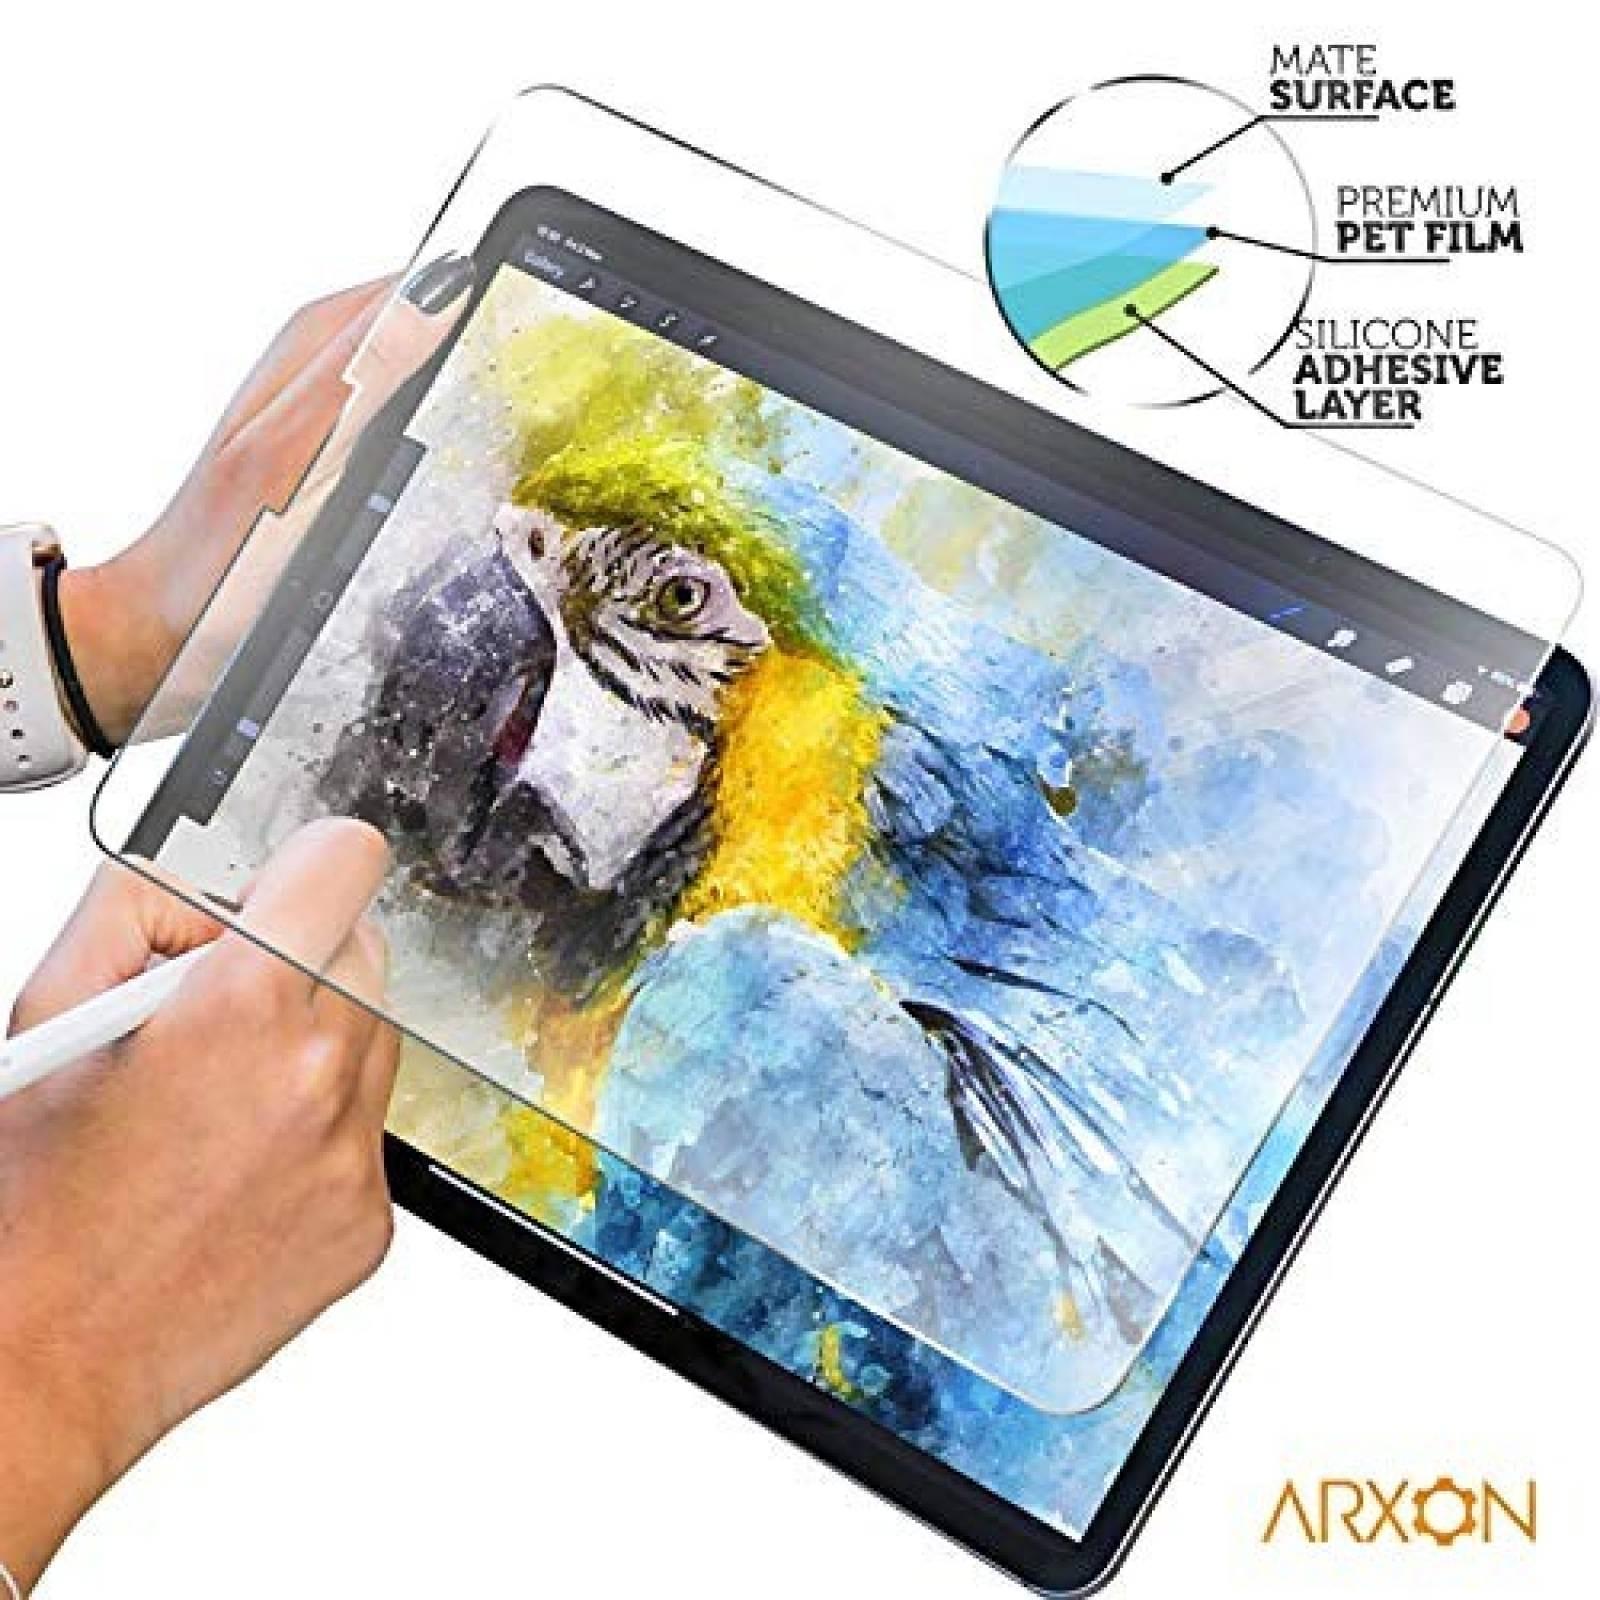 Protector de Pantalla Arxon Para iPad 2018 11''